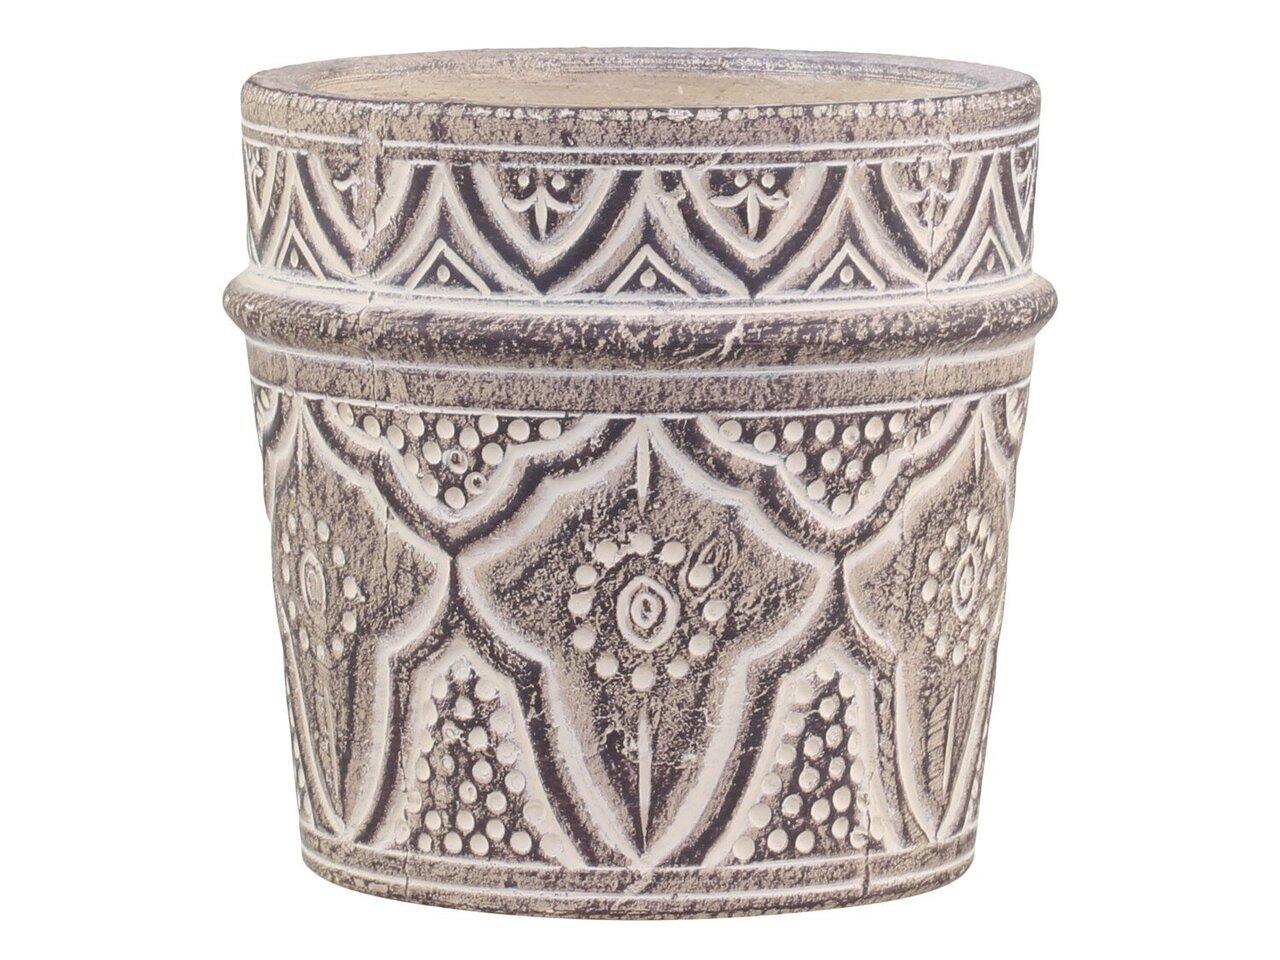 Chic Antique Évron Blumentopf mit Muster